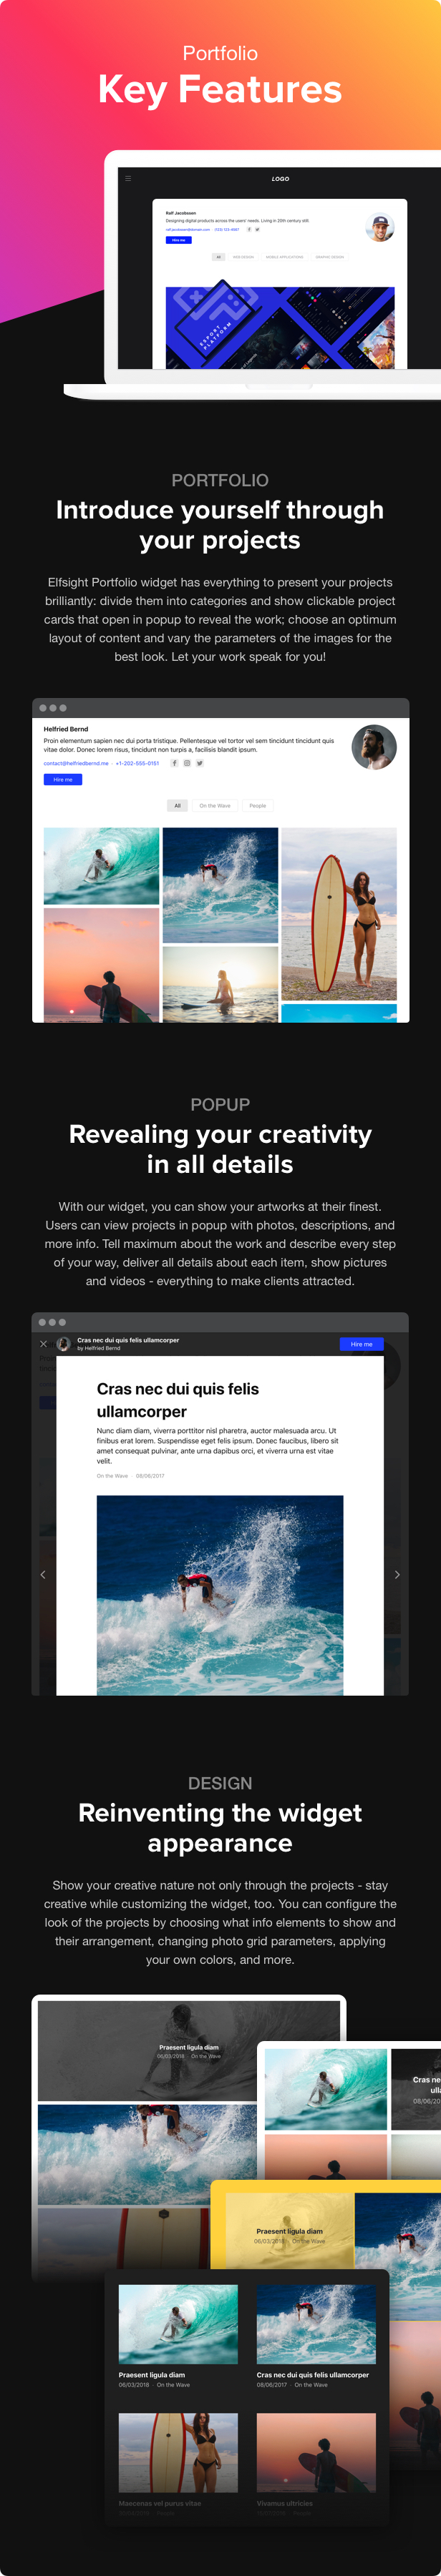 Portfolio Gallery - WordPress Portfolio Plugin - 1